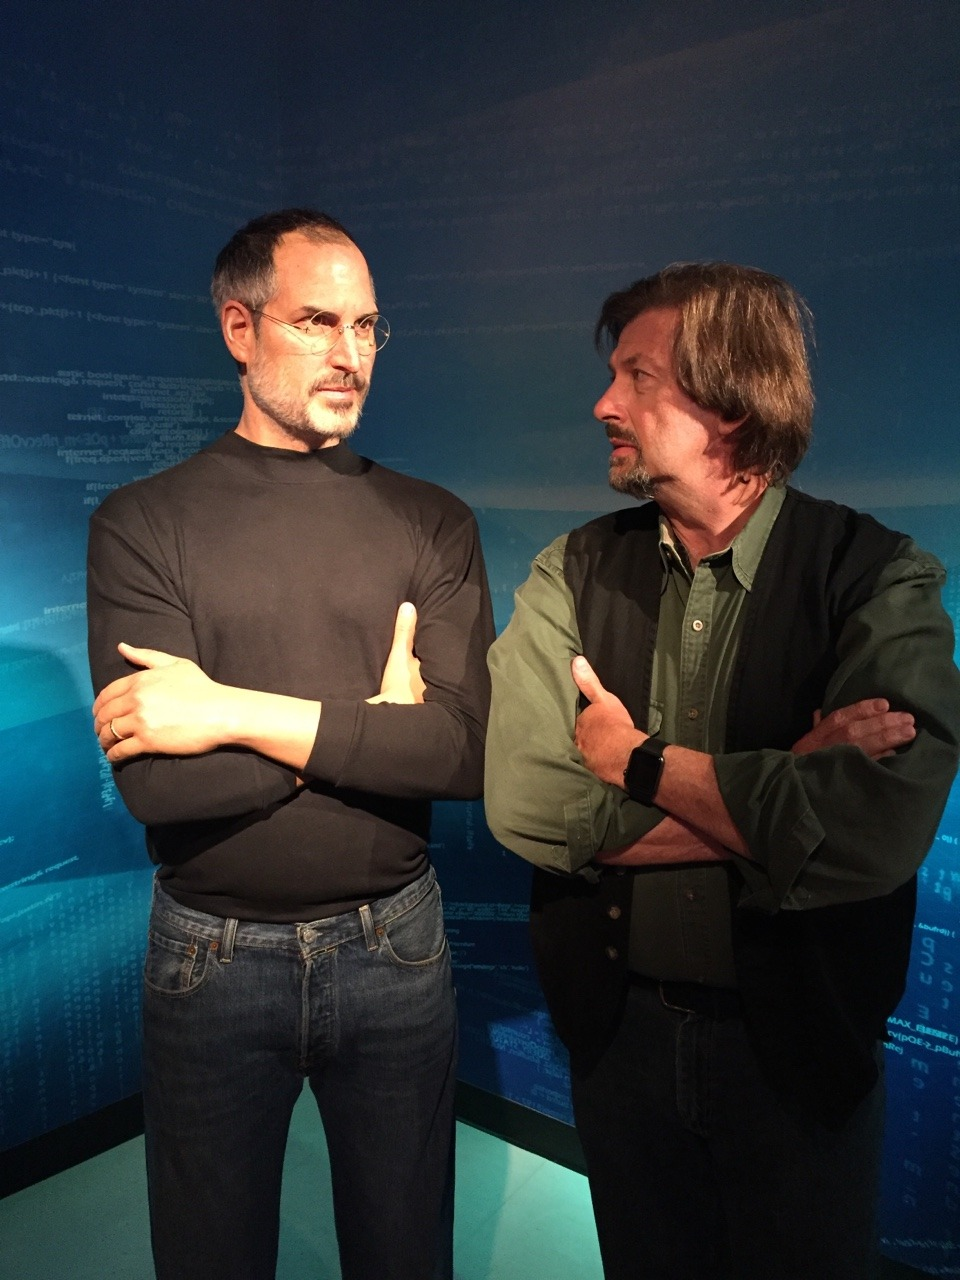 Steve Jobs and Bill.jpg